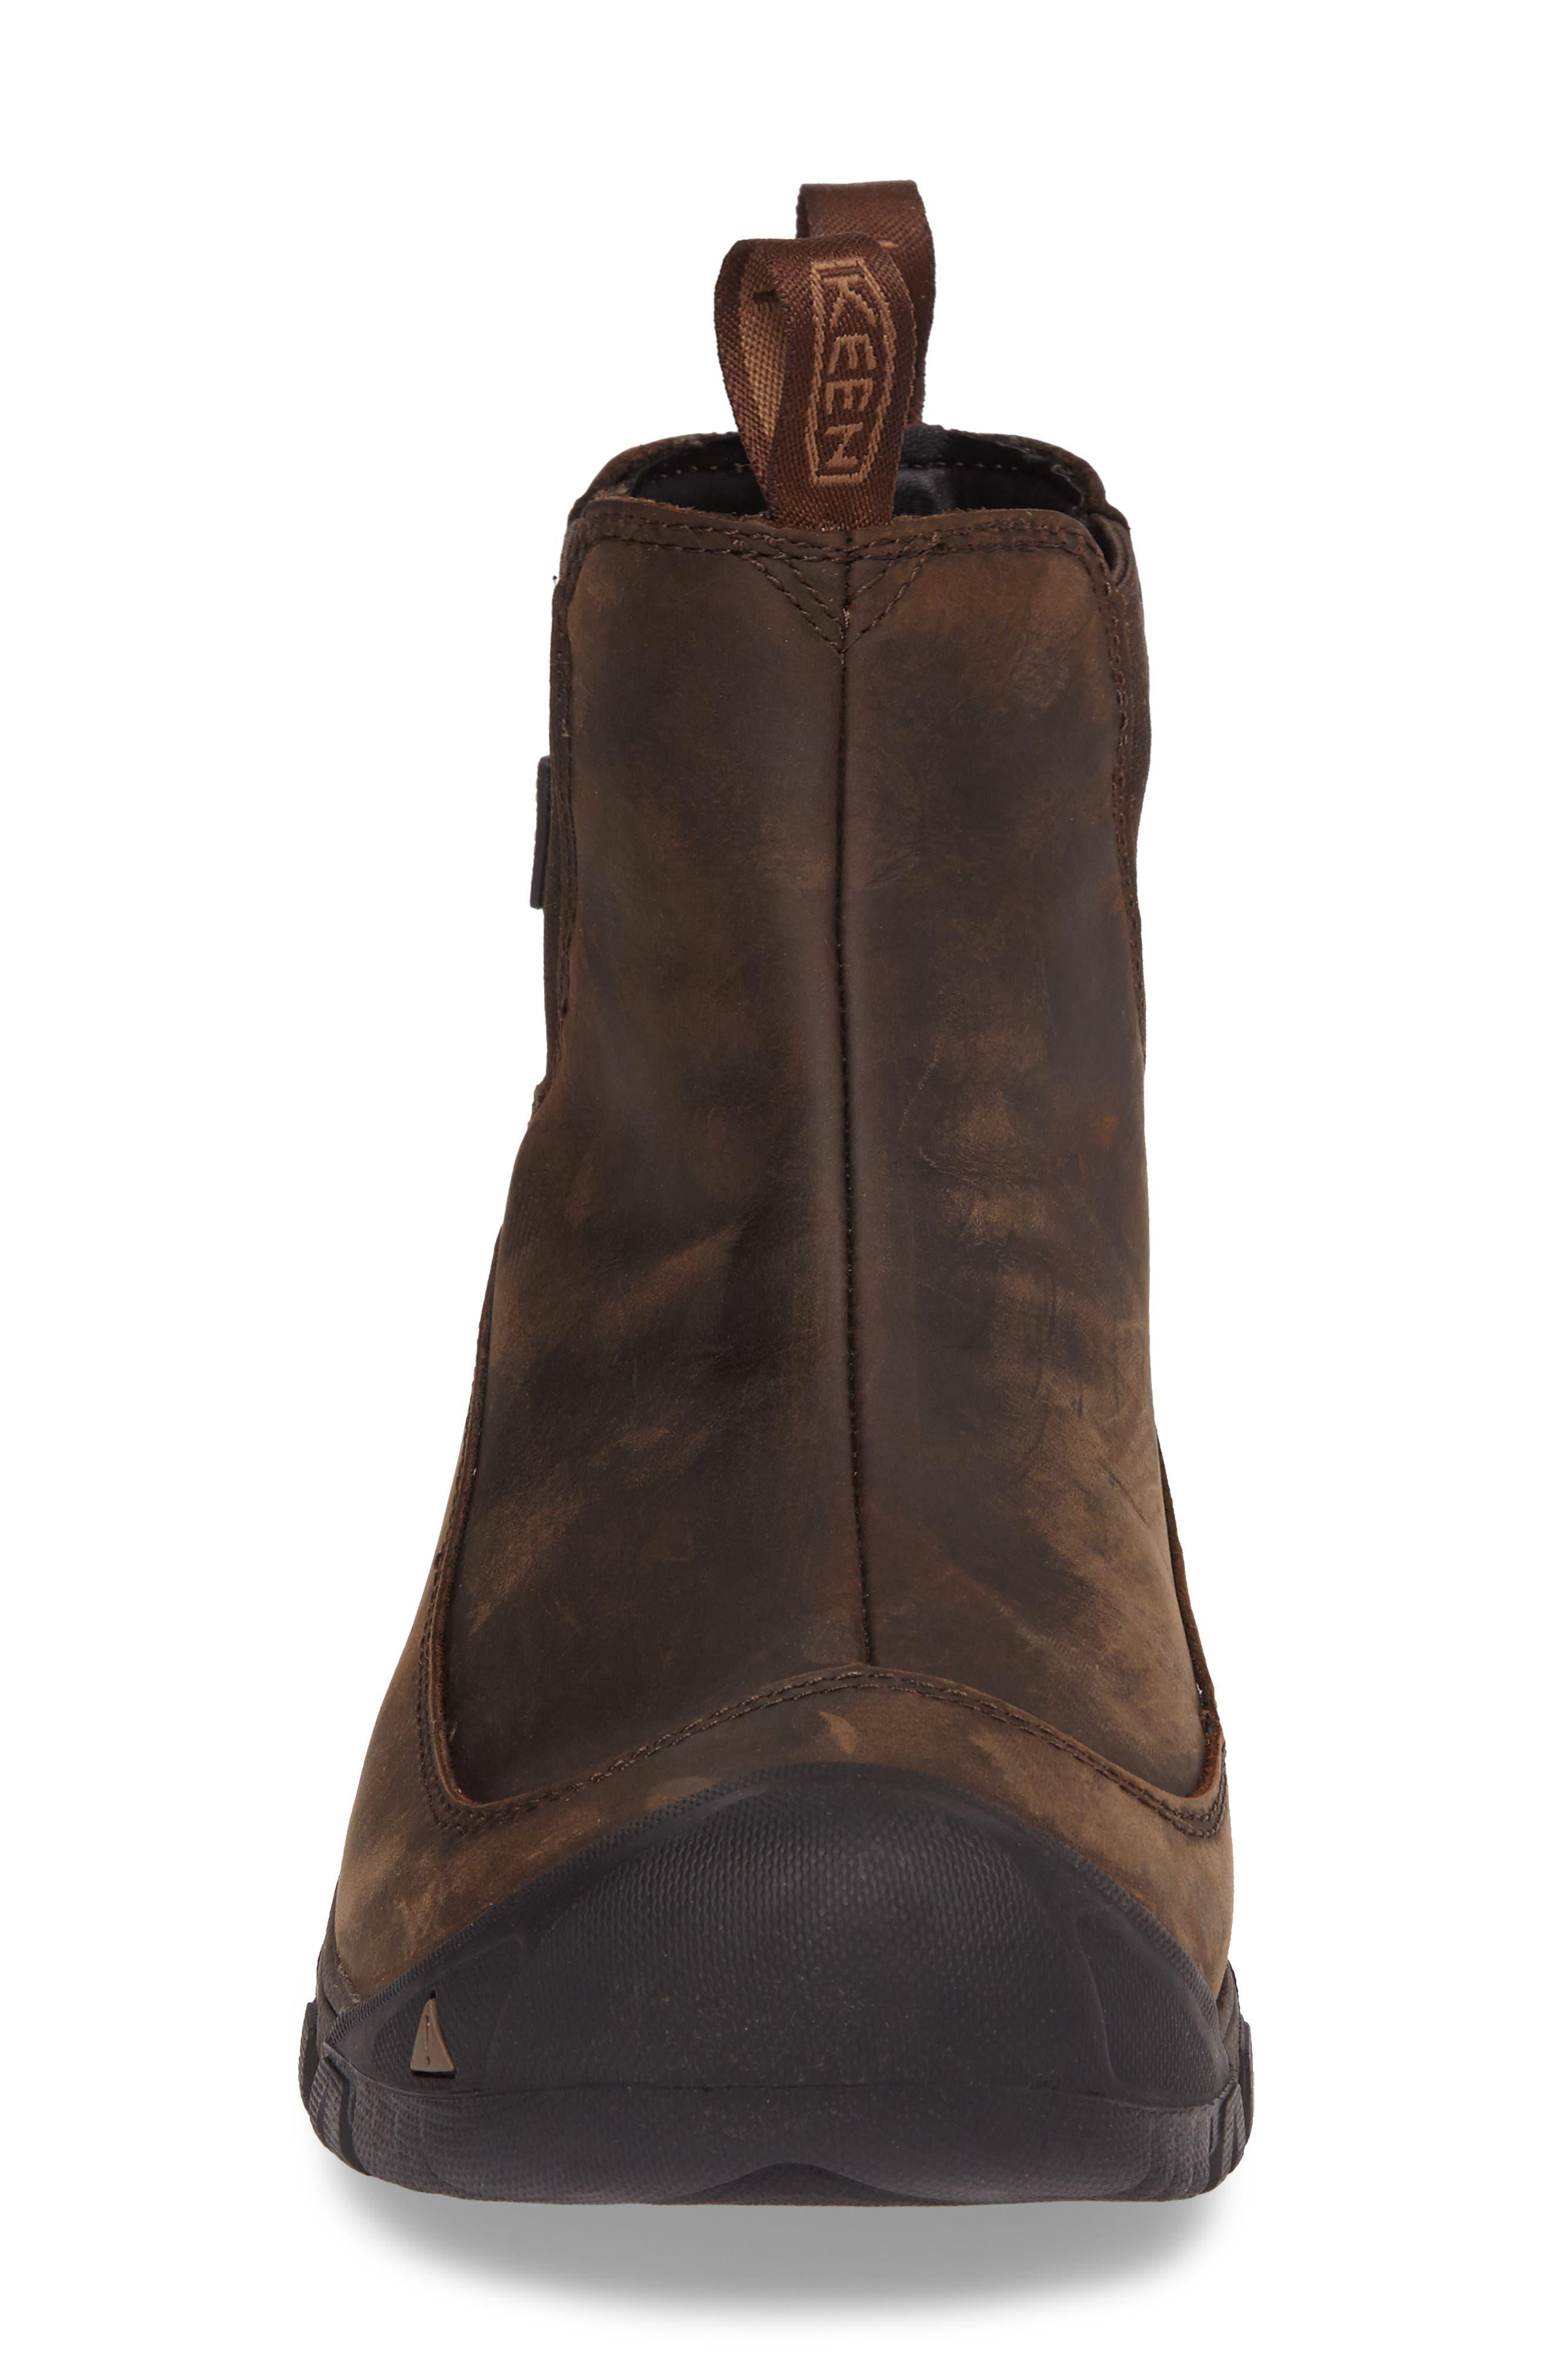 Anchorage II Waterproof Chelsea Boot,                             Alternate thumbnail 4, color,                             DARK EARTH/ MULCH